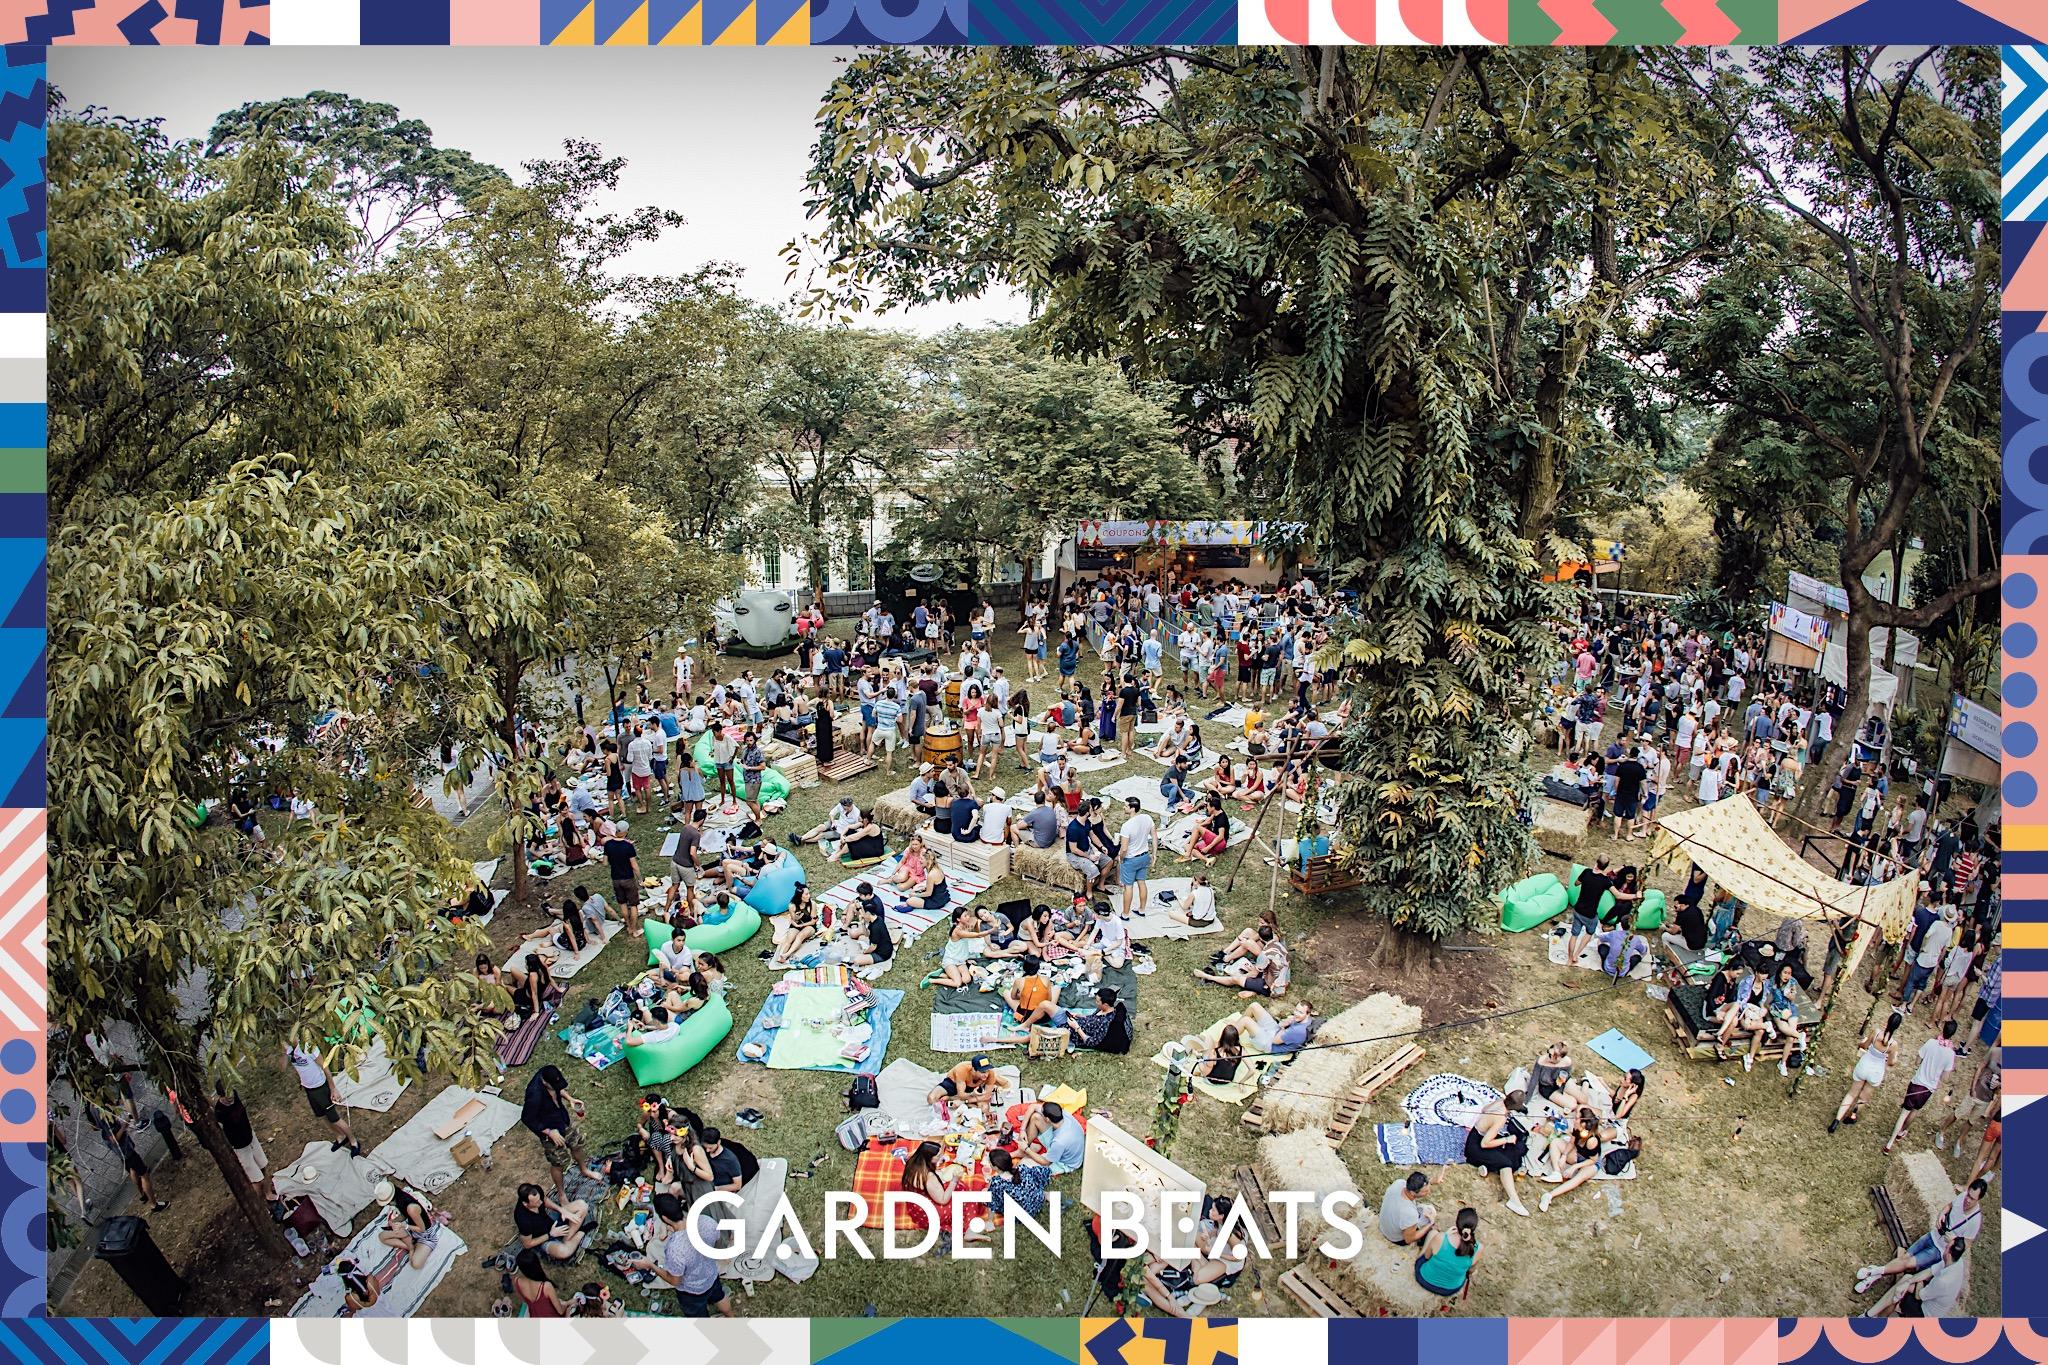 18032017_GardenBeats_Colossal644_WatermarkedGB.jpg